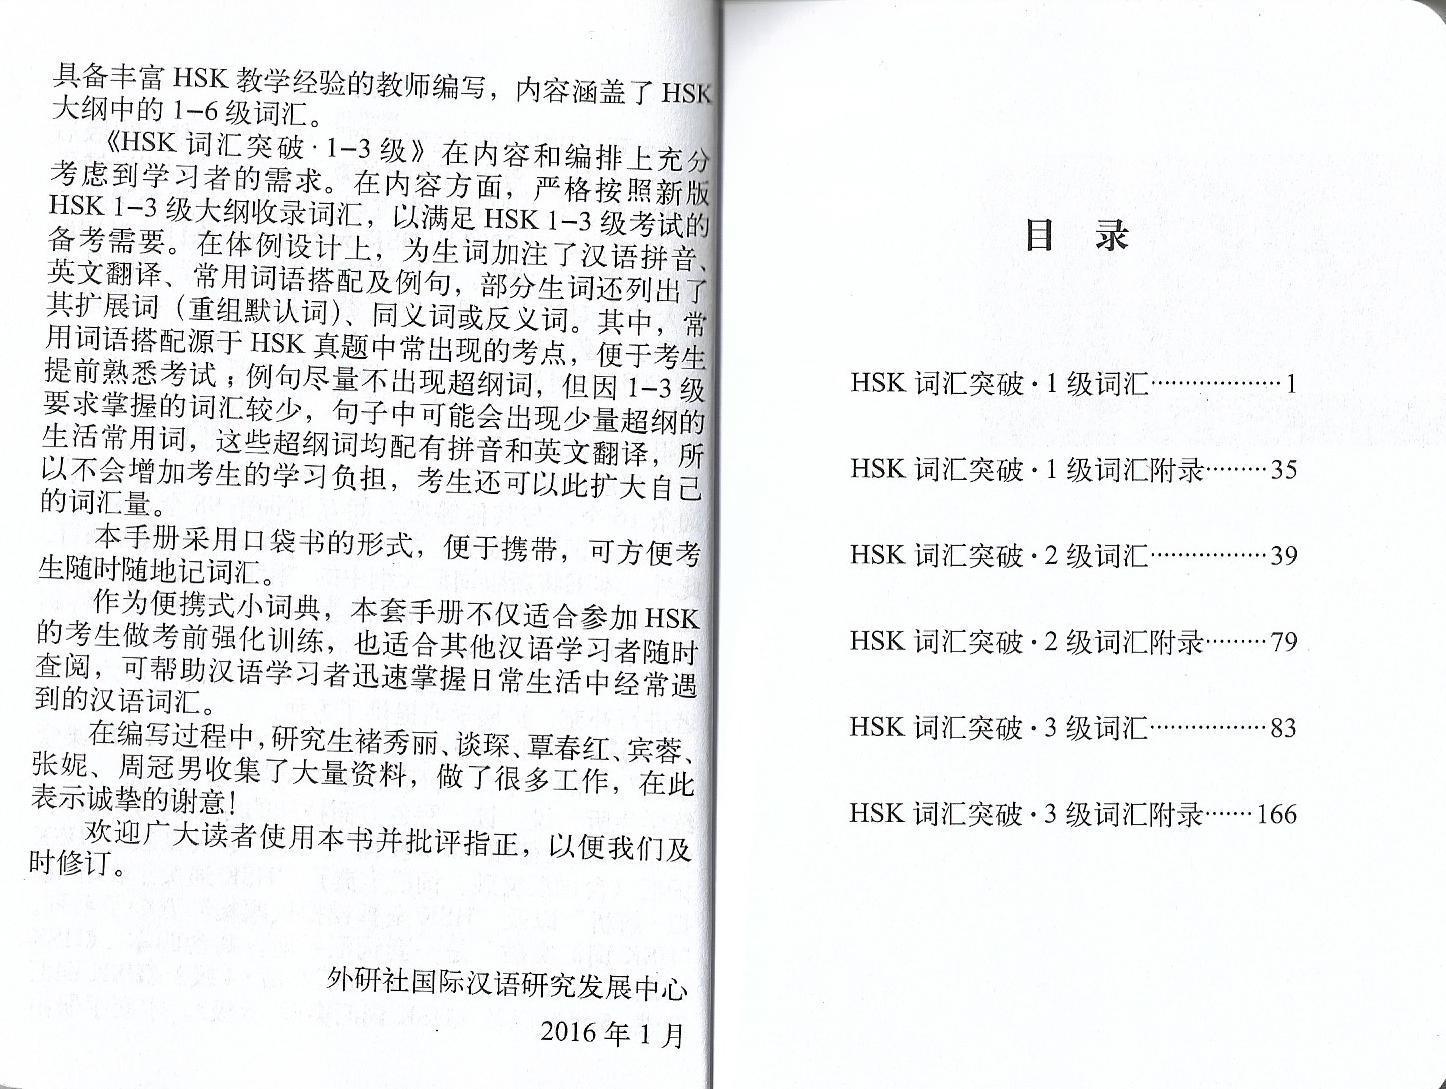 Mandarin Dictionary for HSK Examination: 新 HSK 词汇突破 (1-3 级